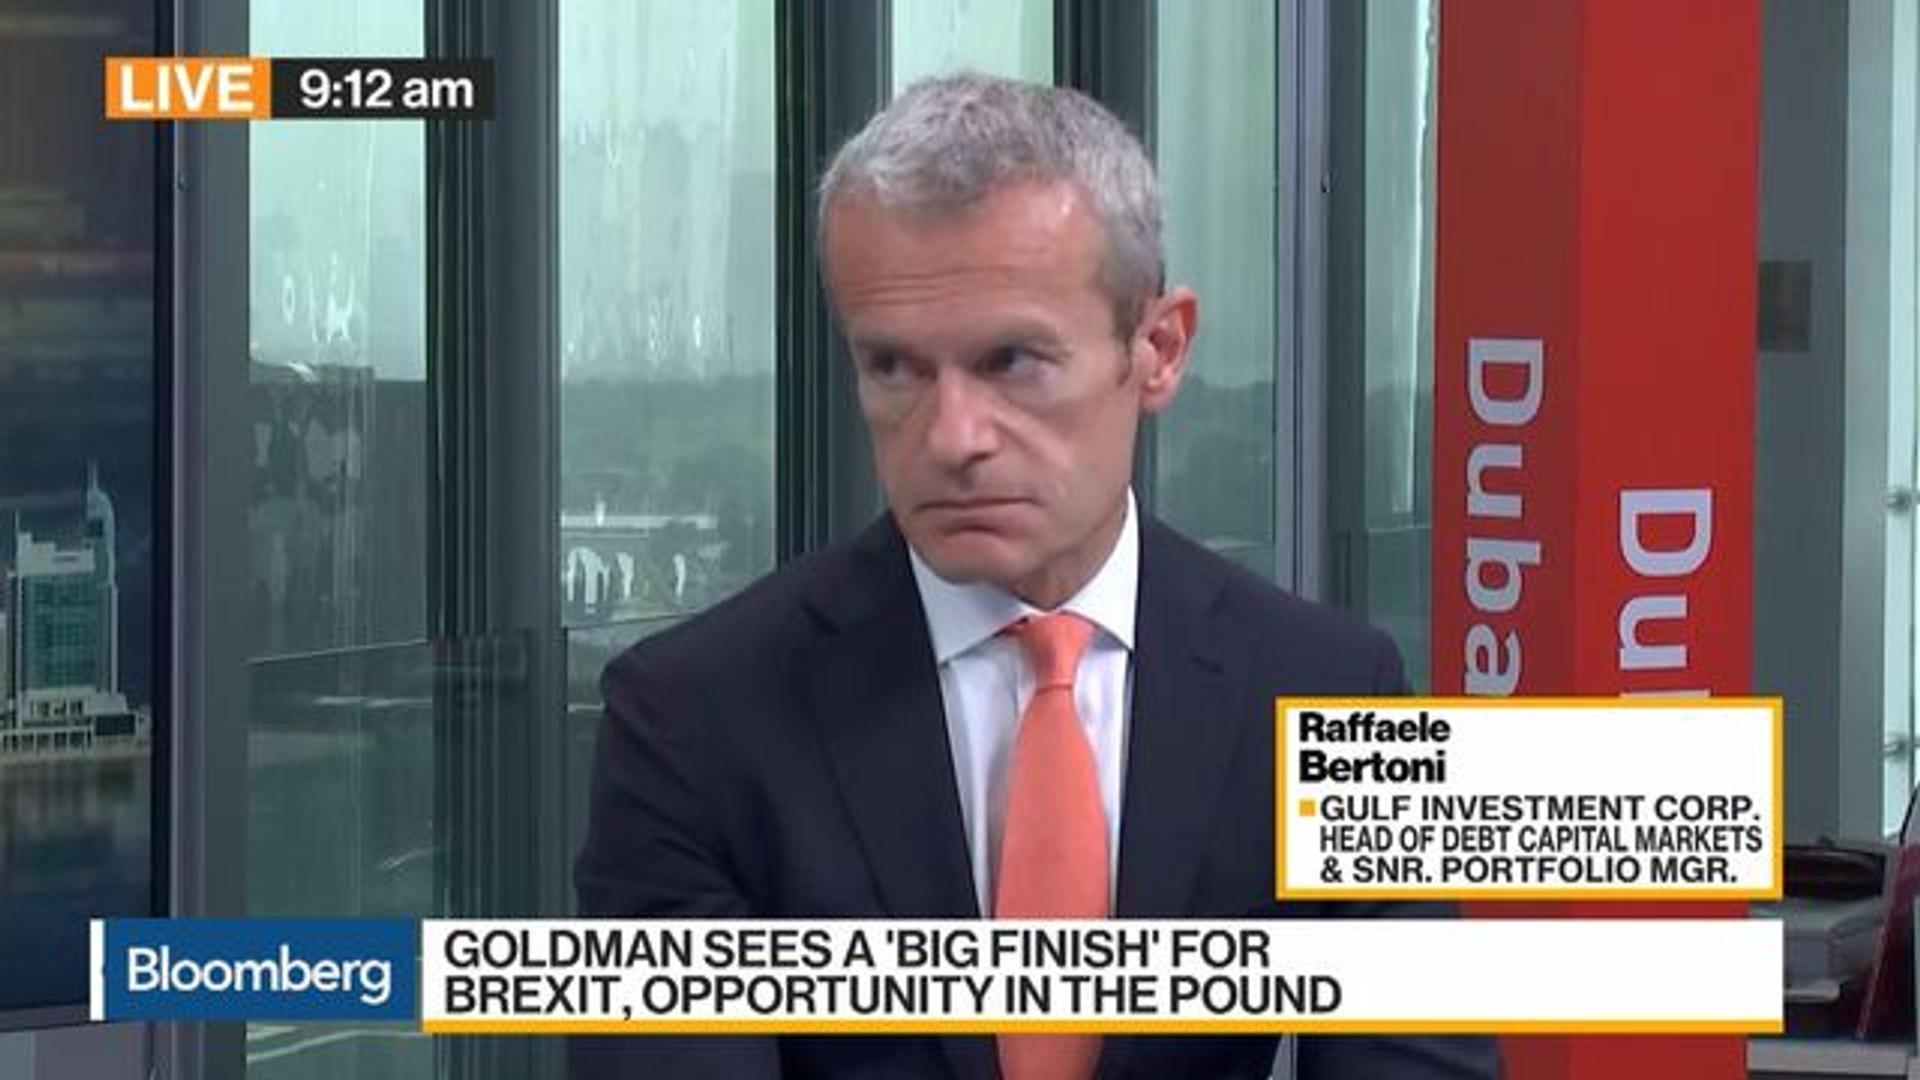 U.K. Pound Is Very Cheap, Says Gulf Investment's Bertoni